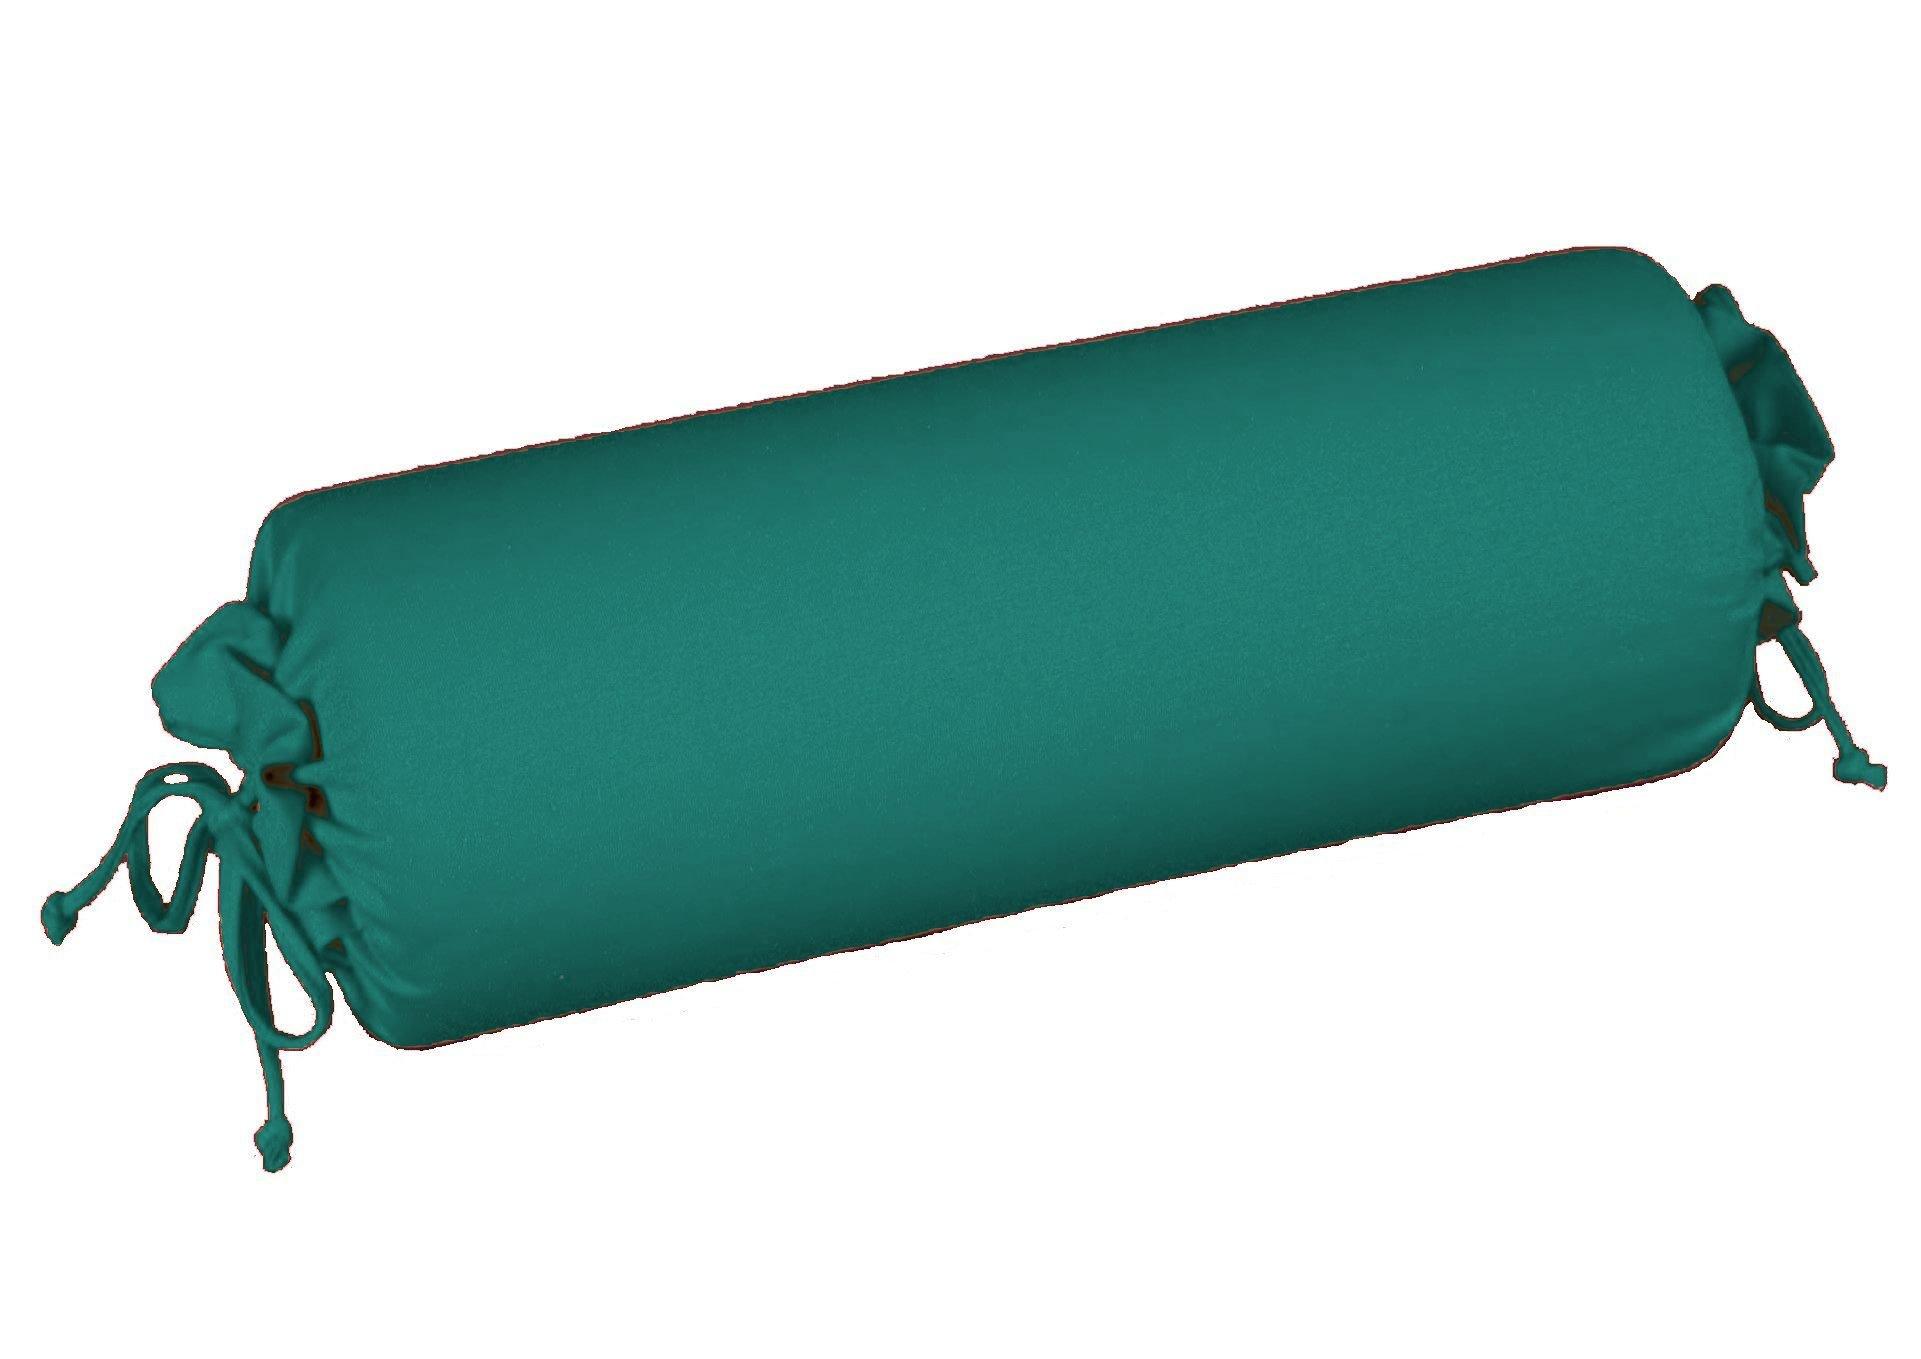 Edel-Zwirn-Jersey salbei B15cm